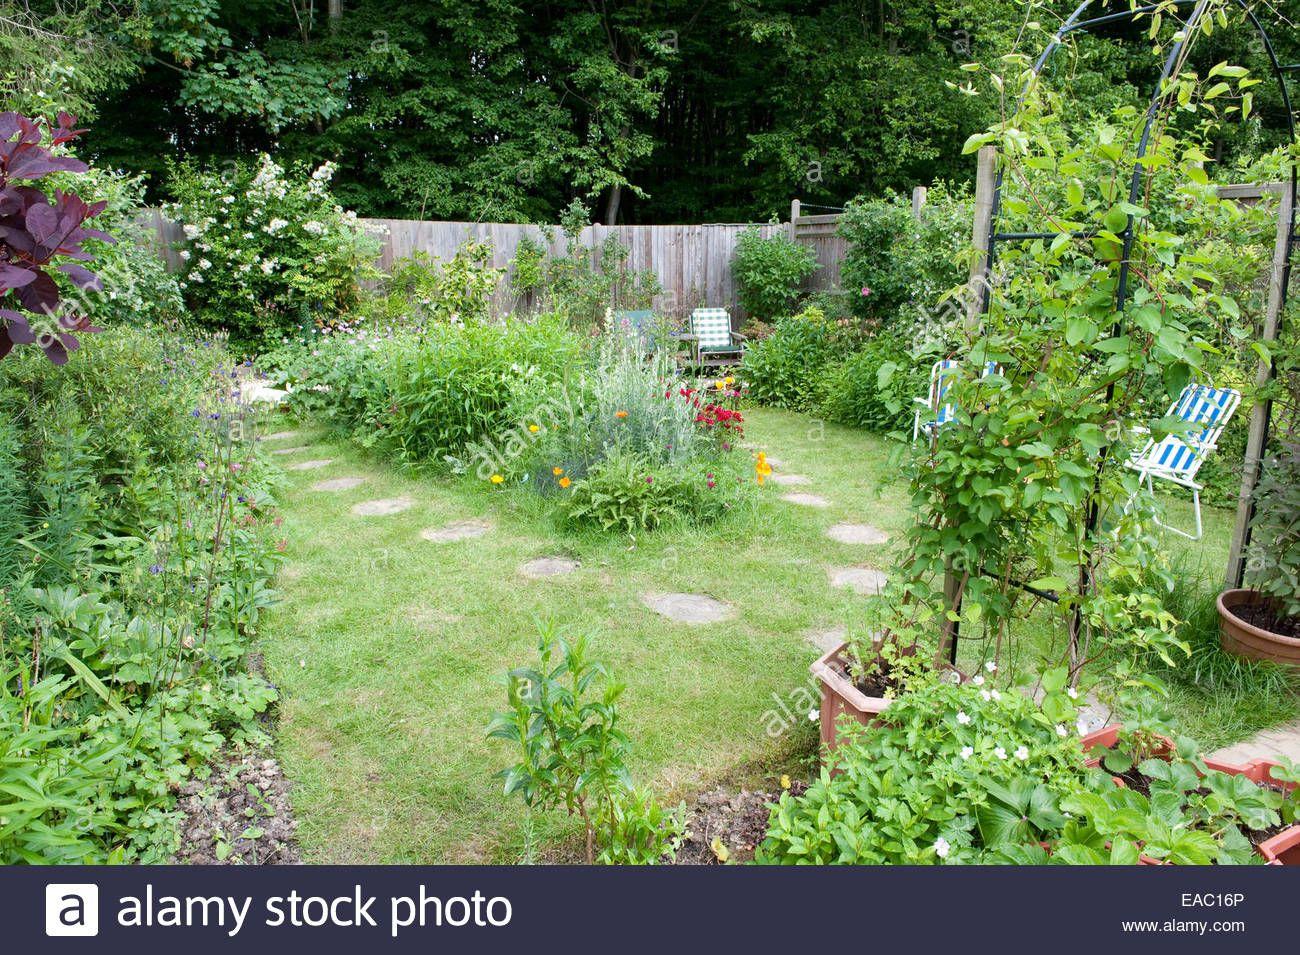 Wildlife Garden Kent UK Stock Photo | Ponds and Bogs for Wildlife ...